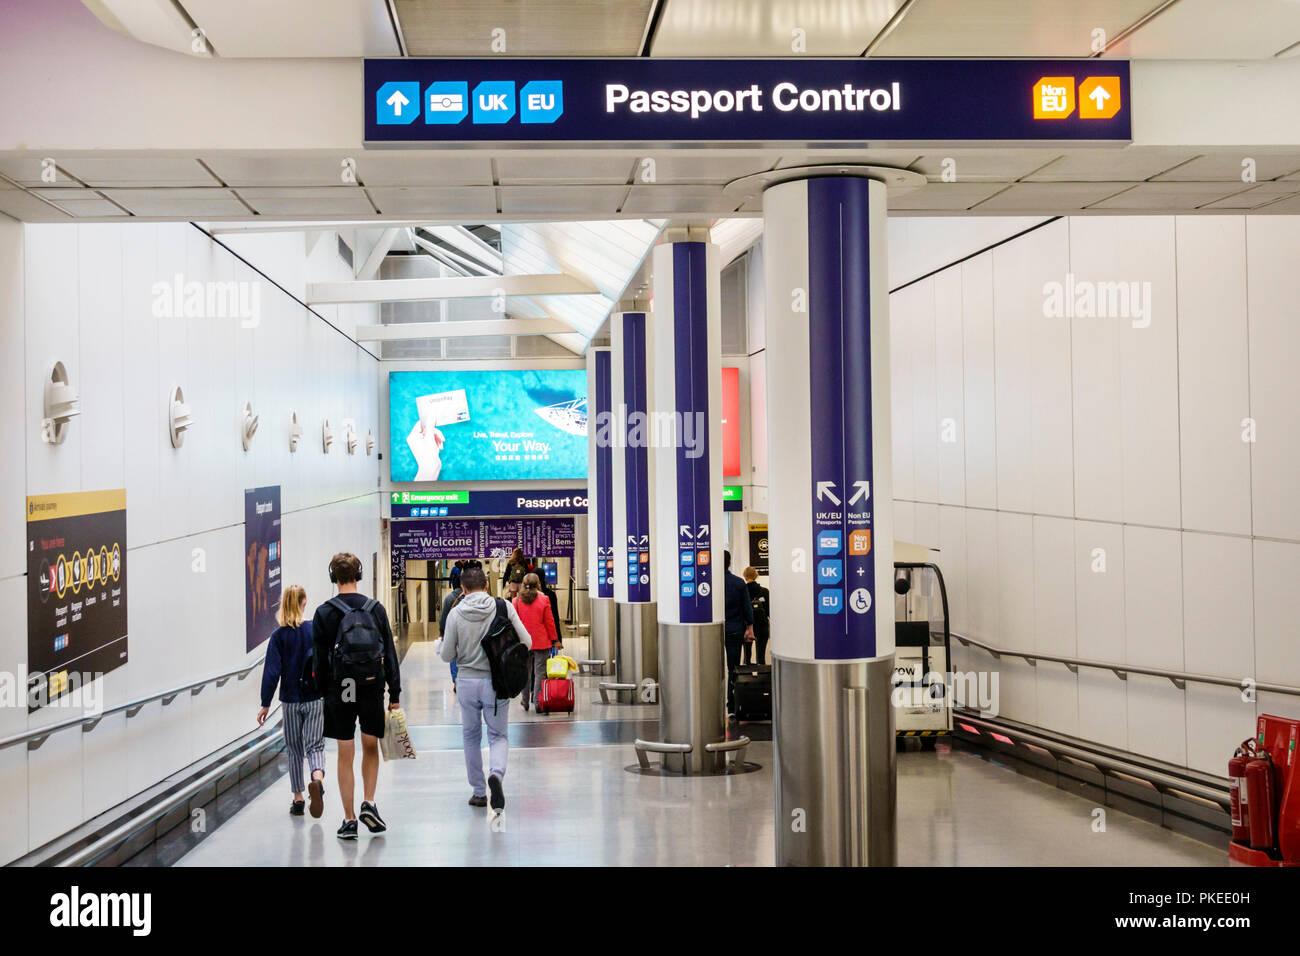 London England Great Britain United Kingdom Heathrow Airport LHR ramp passport control sign directions - Stock Image